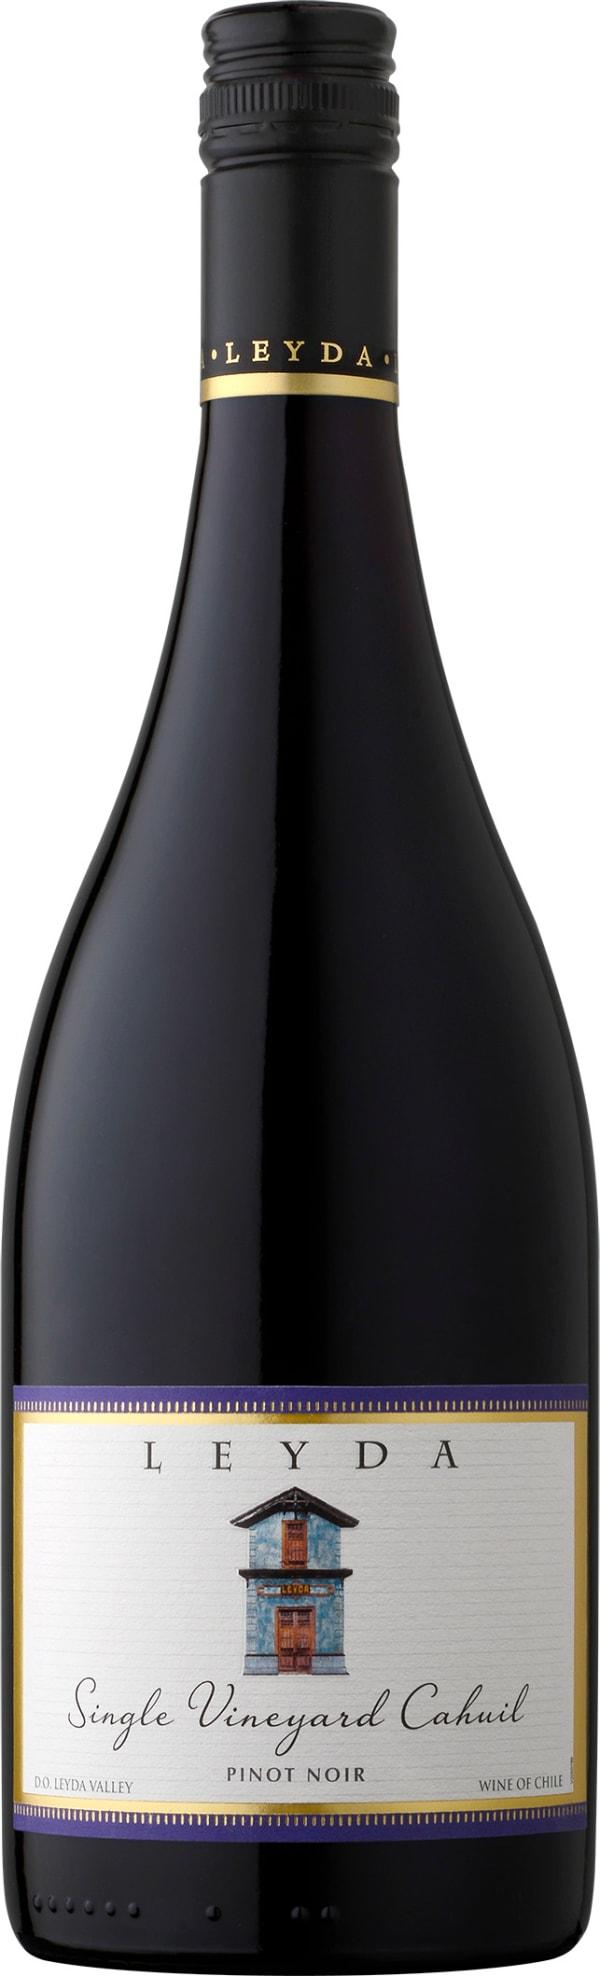 Leyda Single Vineyard Cahuil Pinot Noir 2014